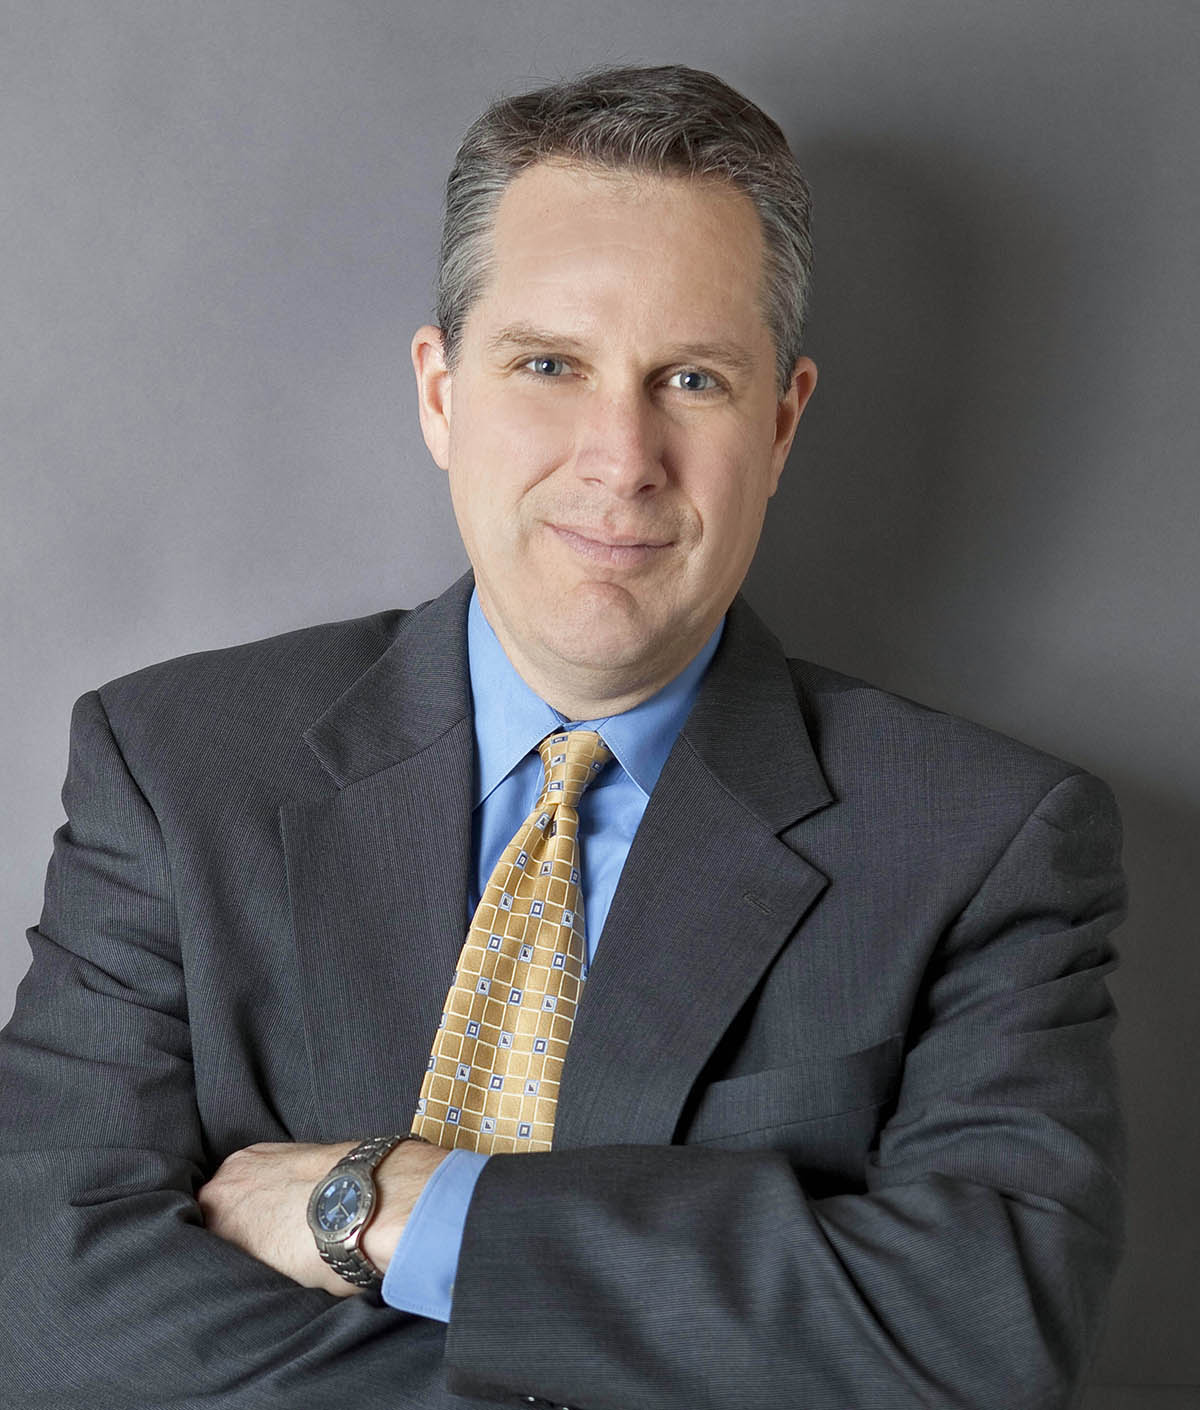 Monona Bank Business Banker Michael Flynn